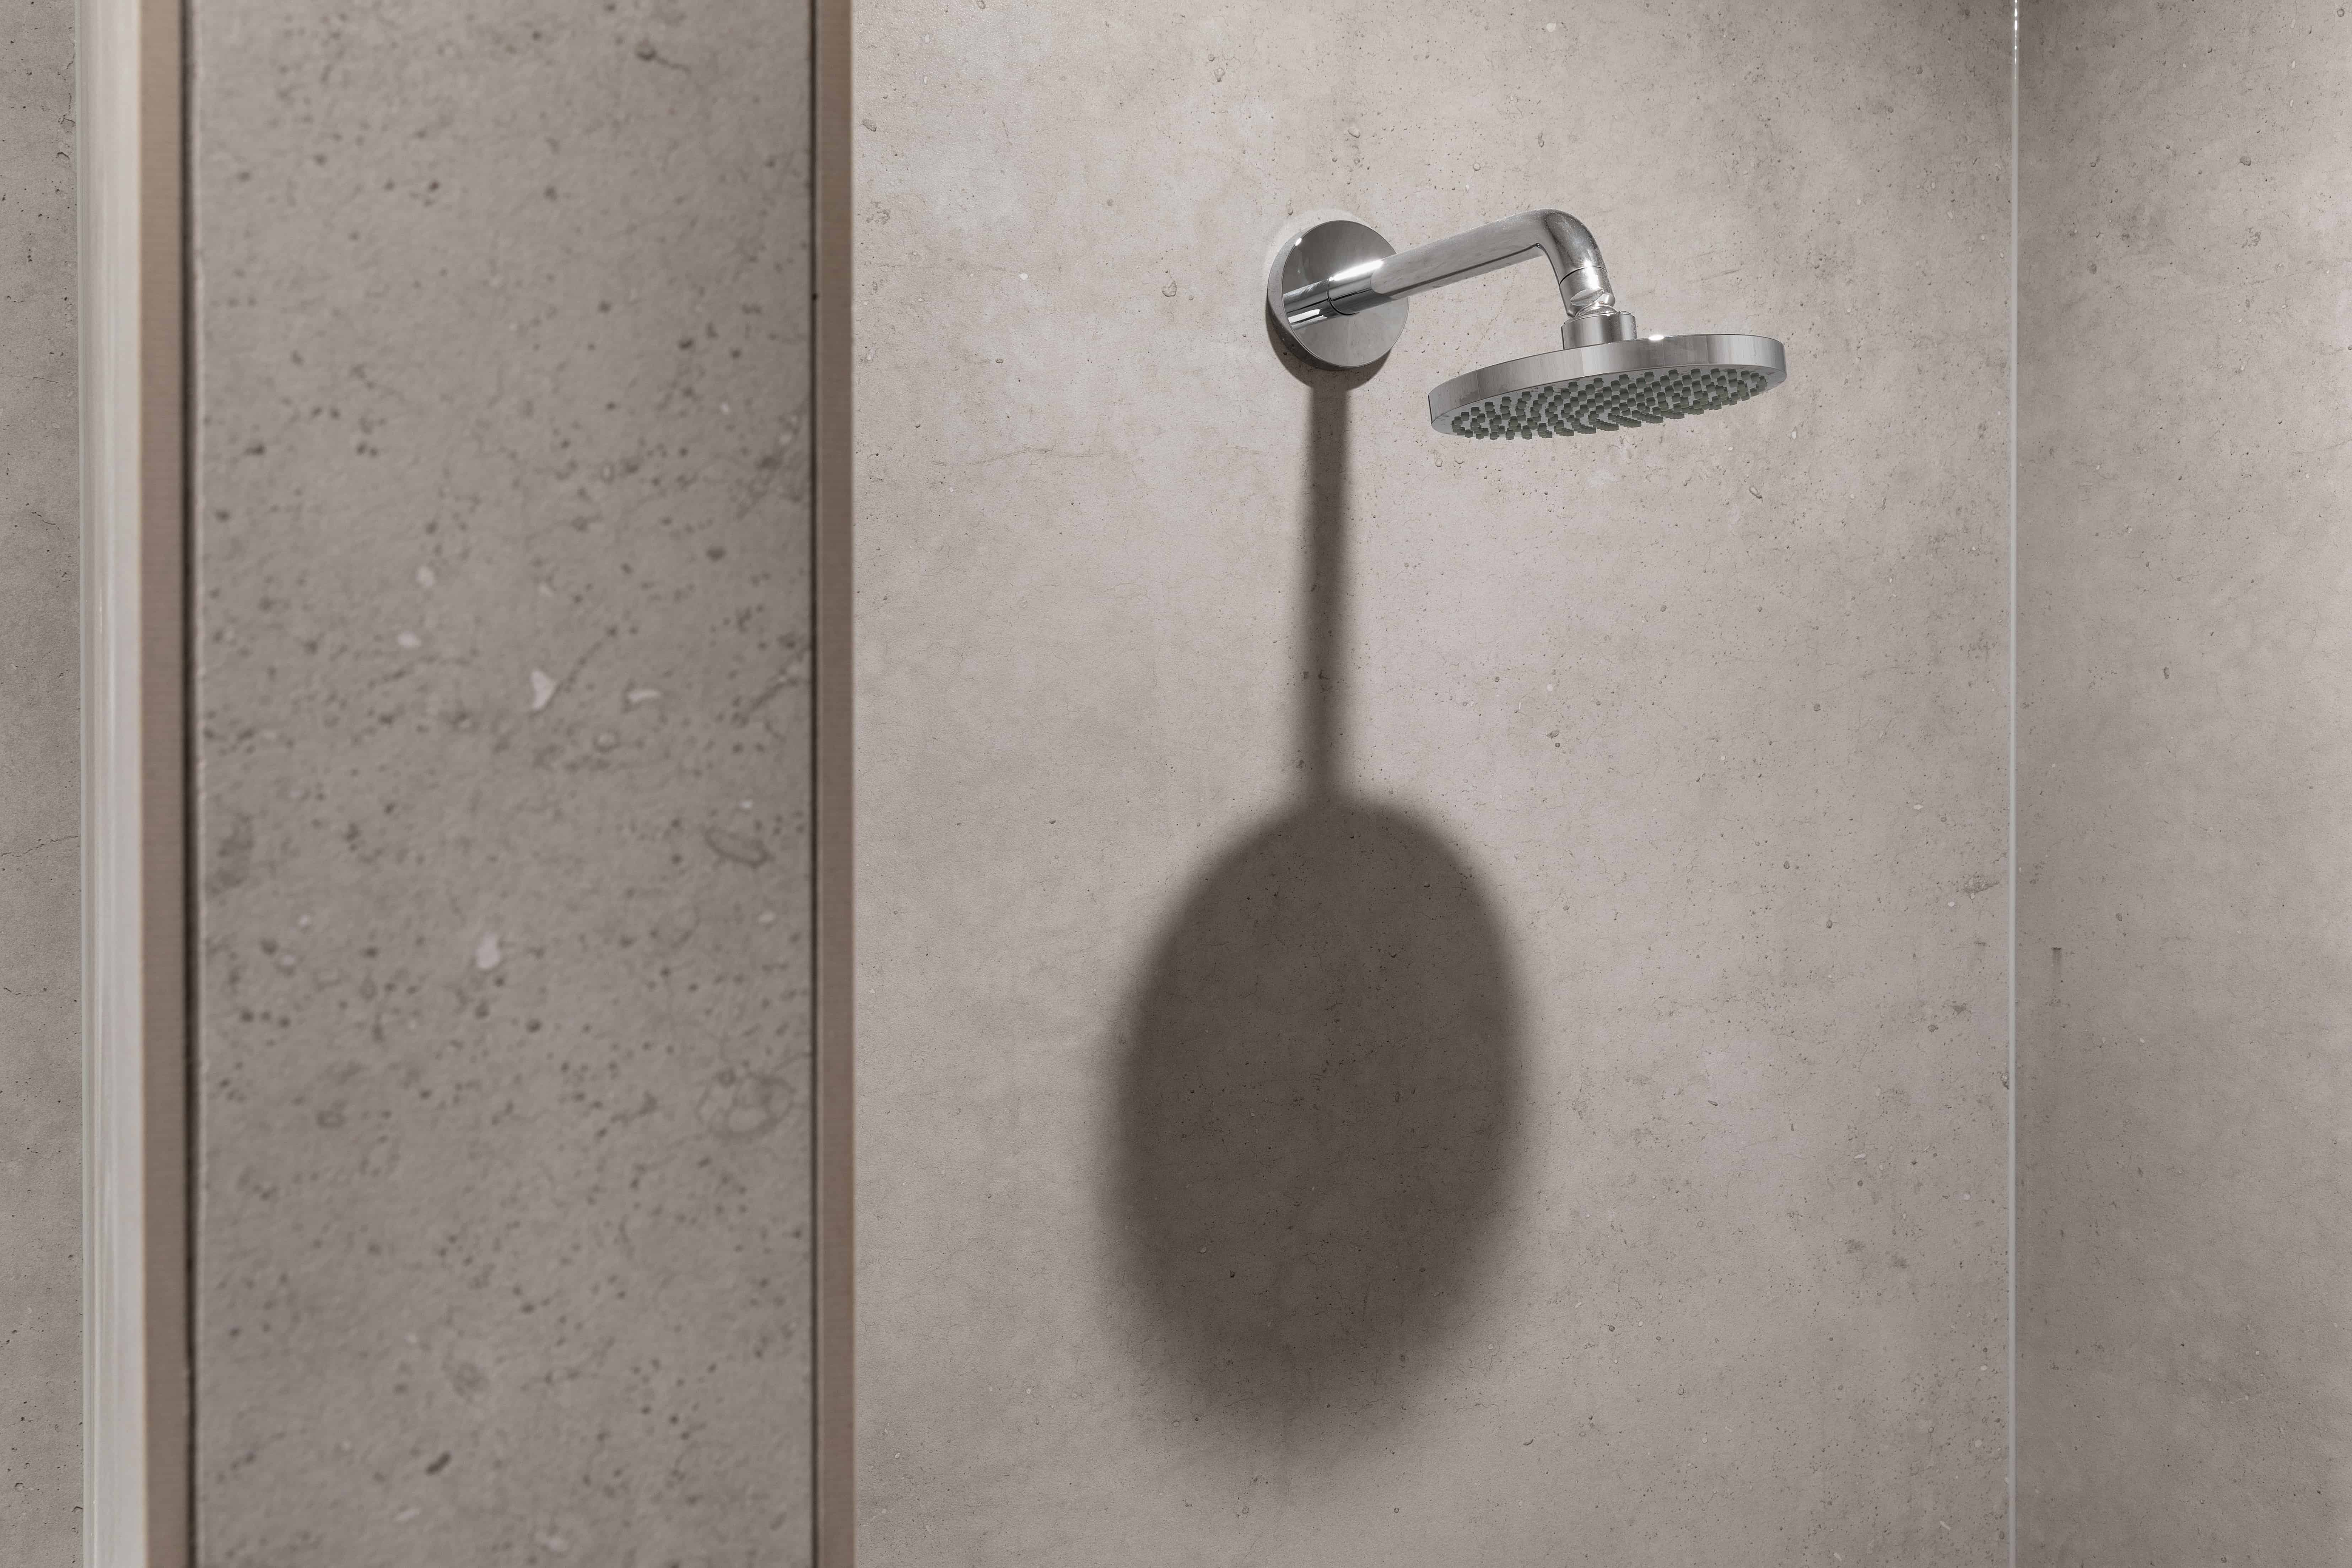 douche met XXL tegels stijlvol - XXL tegels in badkamer - modern